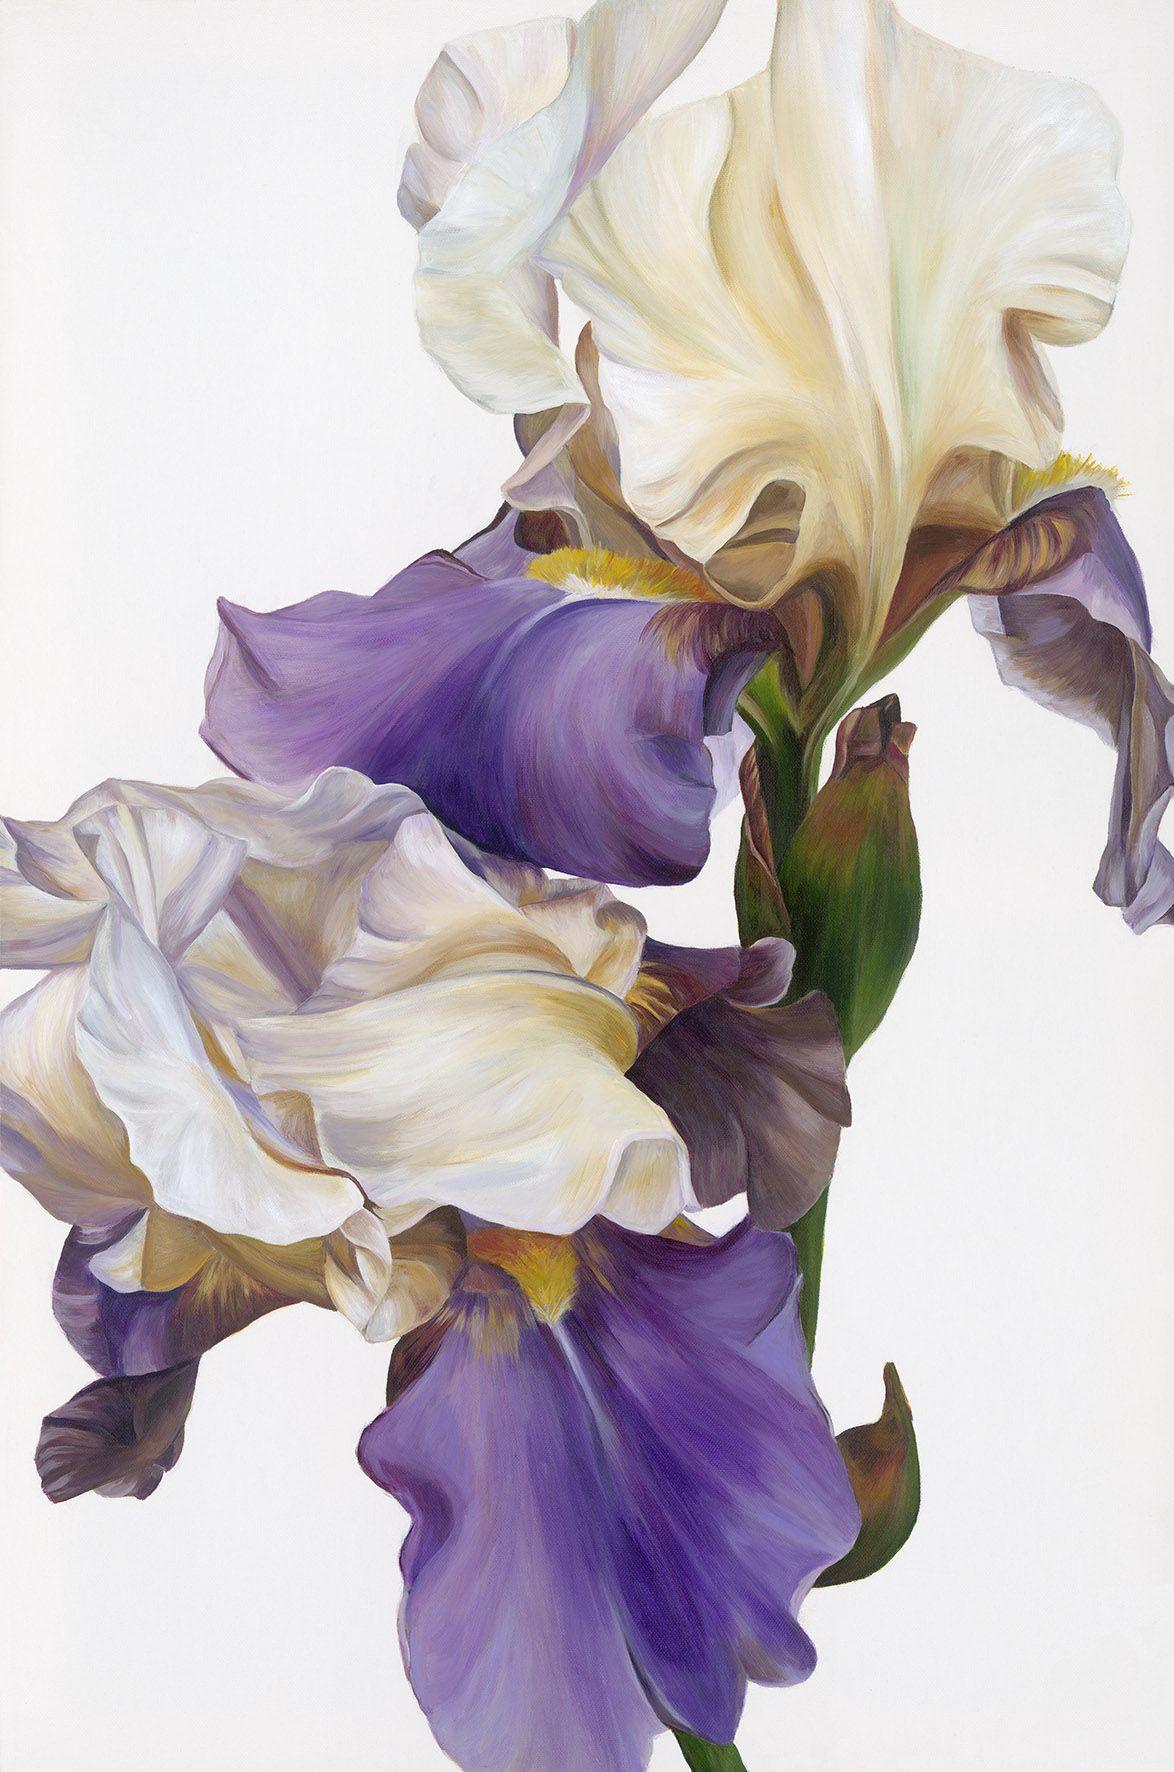 Freya powell sanguine print art pharmacy iris